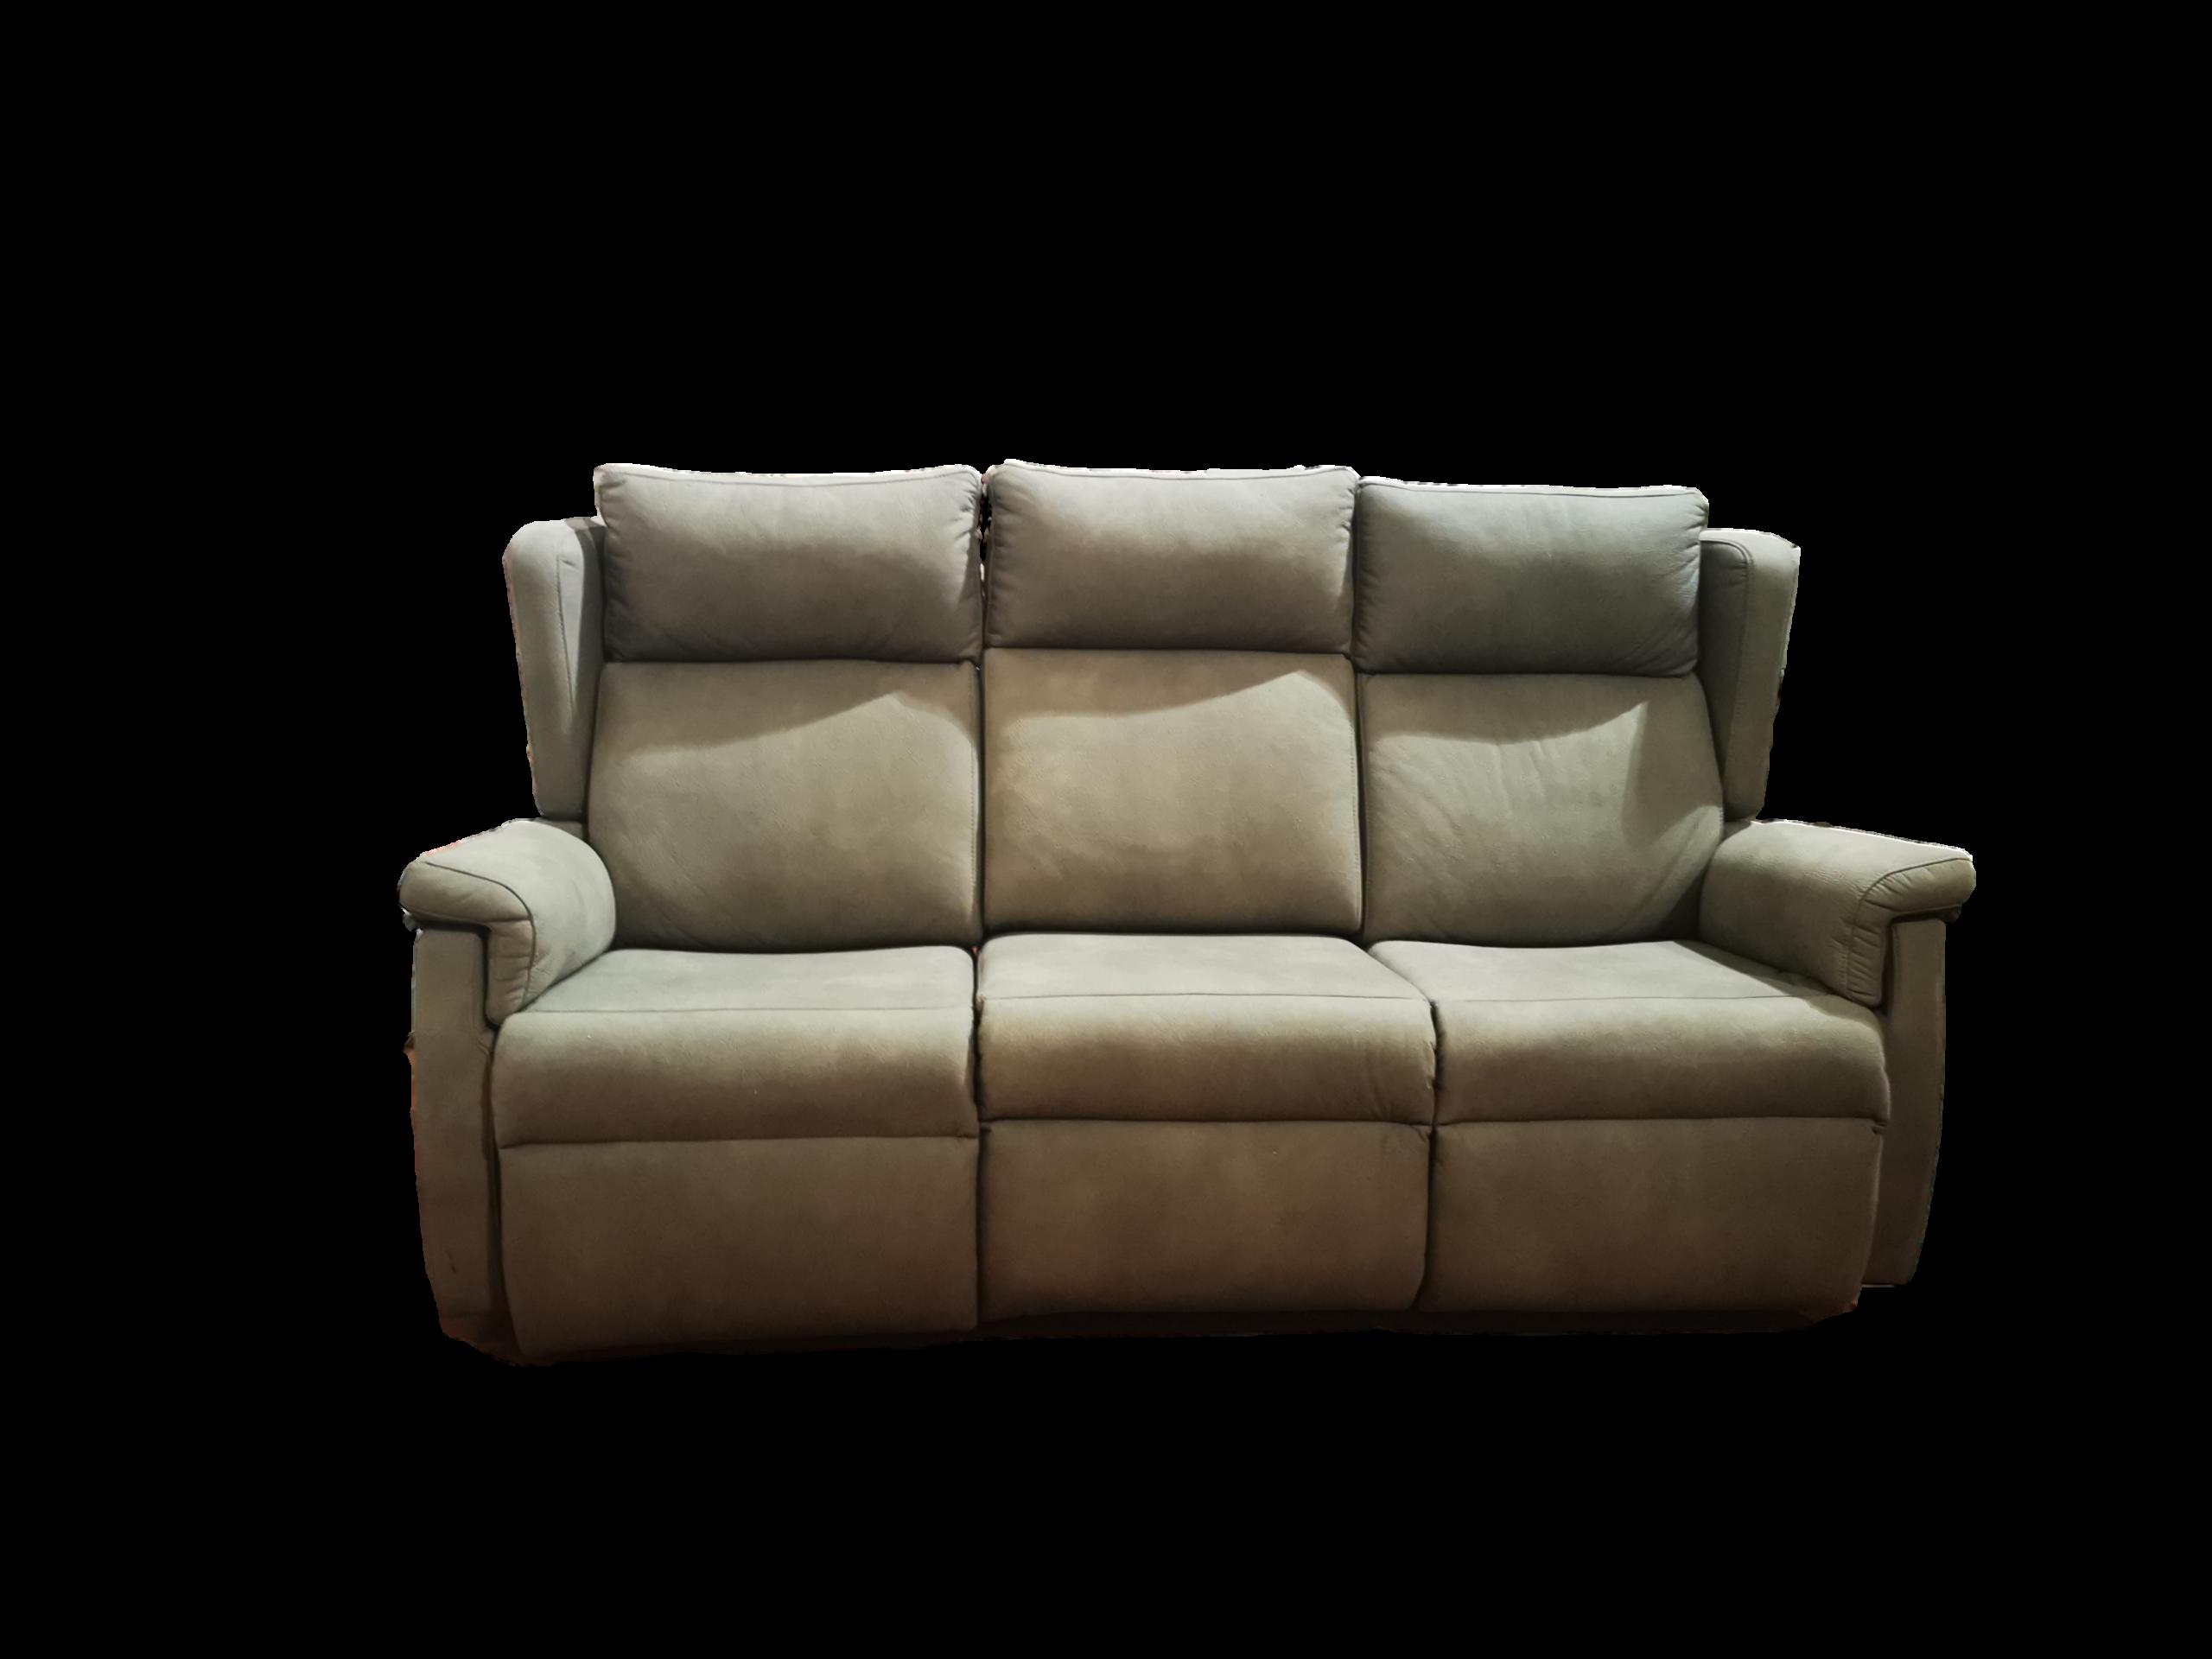 sofa-modelo-aries-1-motor-levantapersonas-1-motor-950e